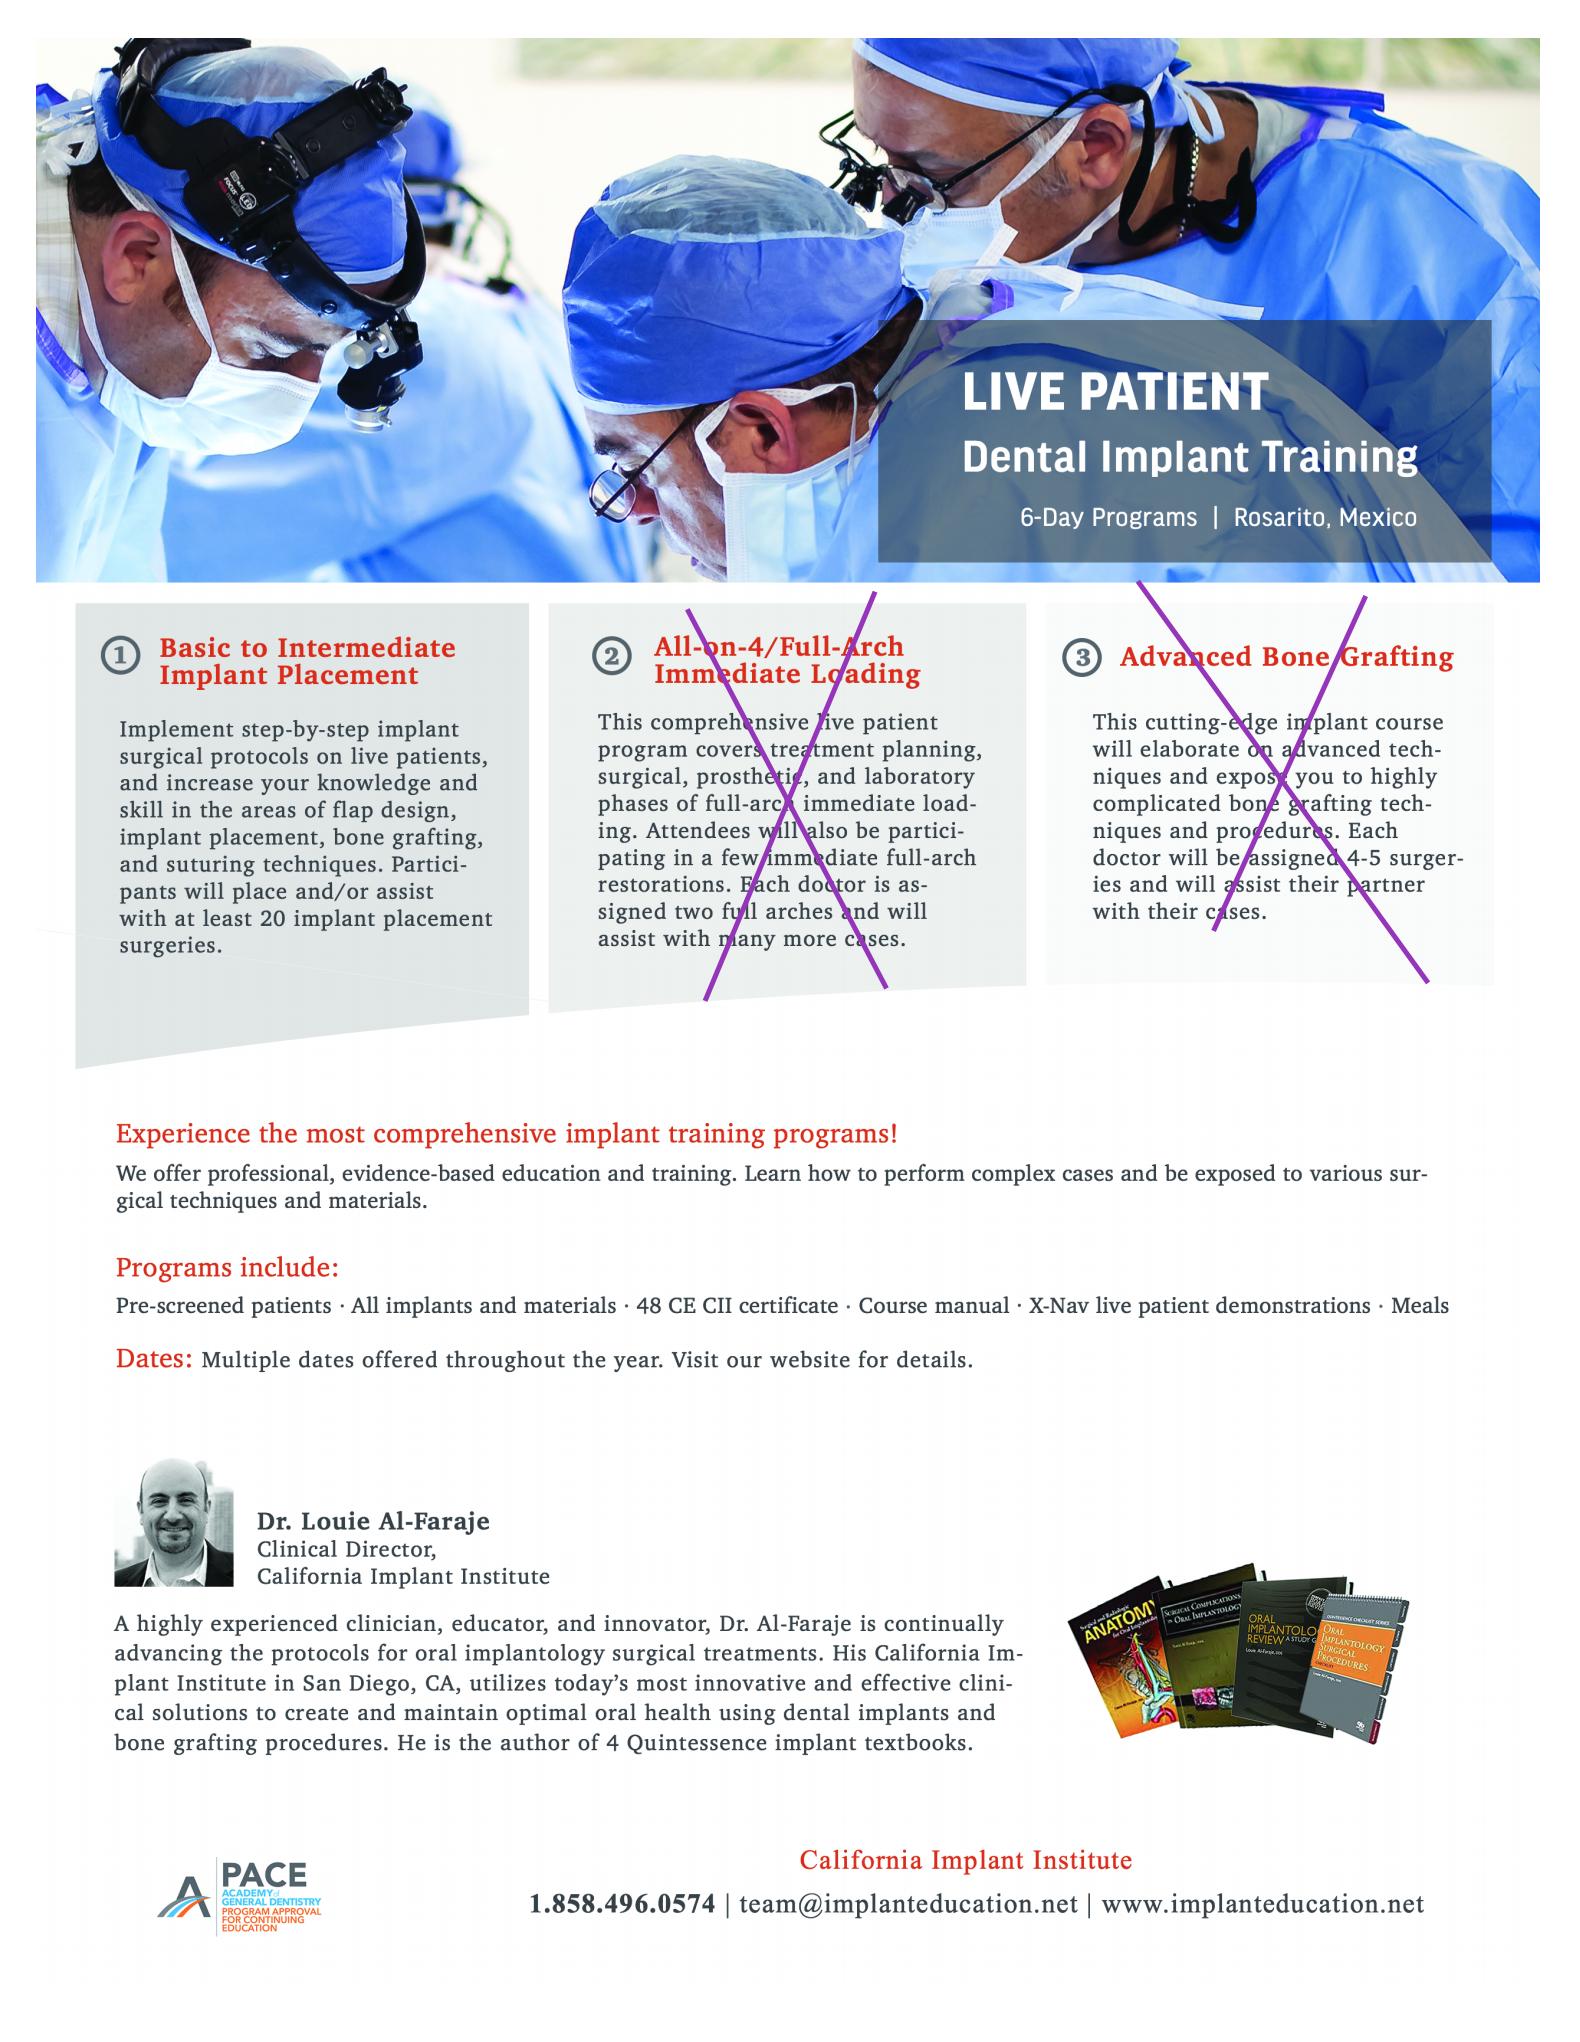 Live Patient Zygomatic Implant Training